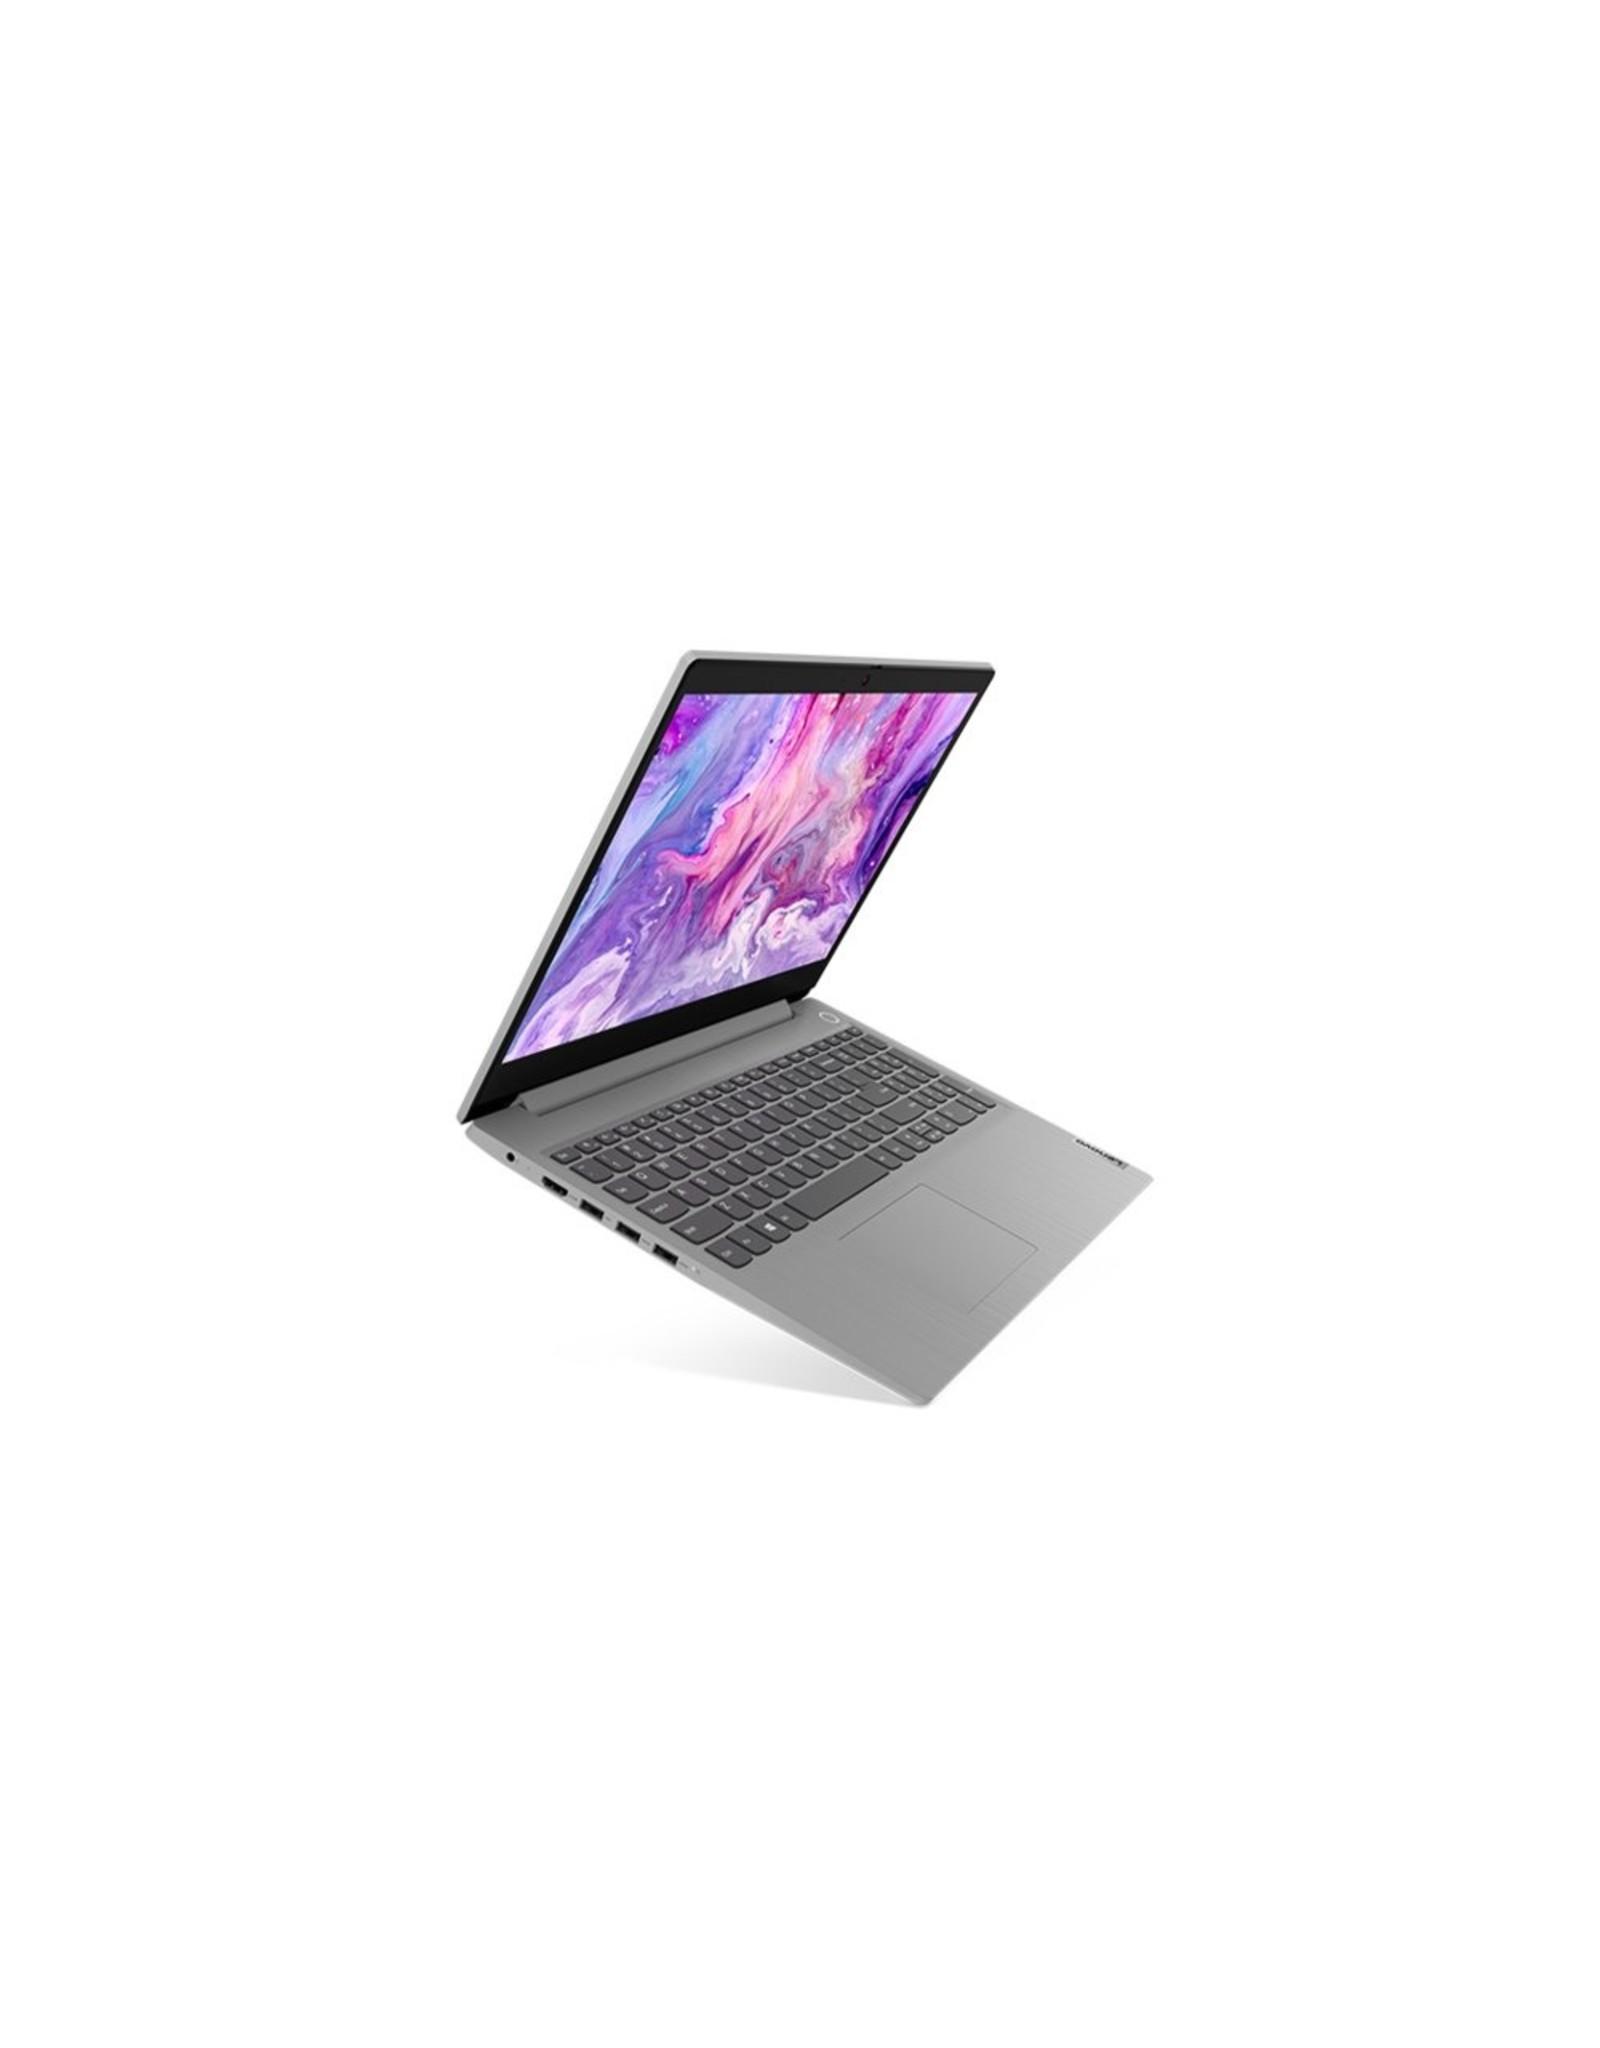 Lenovo IdeaPad 3 15.6 F-HD / i3-1005G1 / 8GB / 256GB / RFS (refurbished)